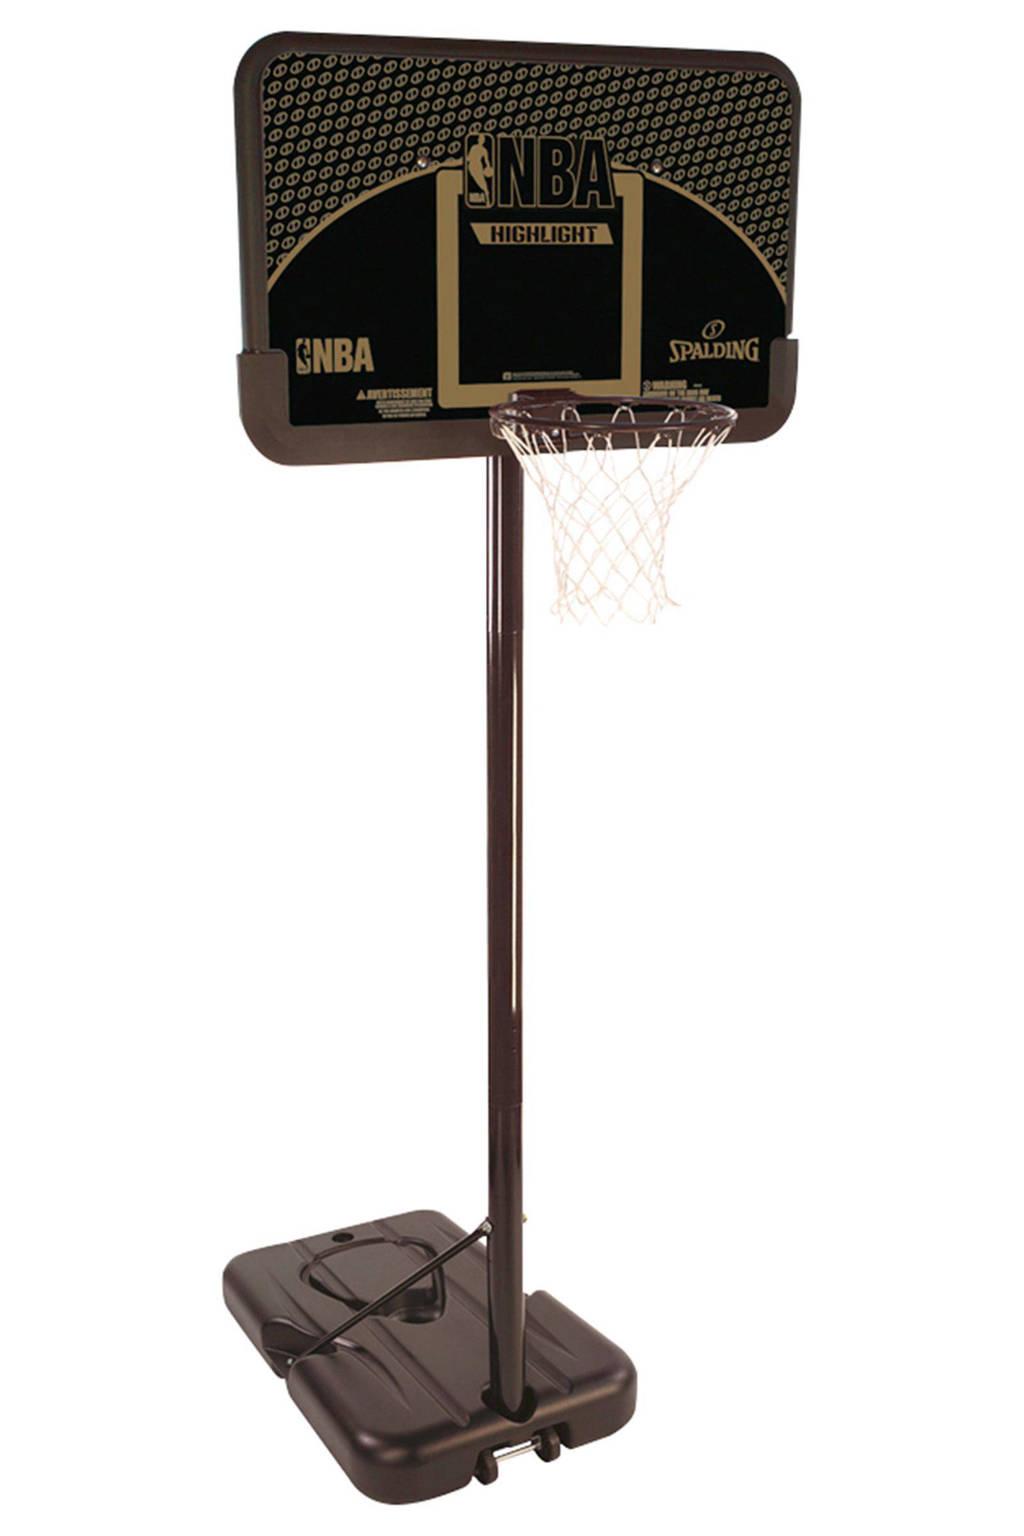 Spalding Highlight basketbalsysteem